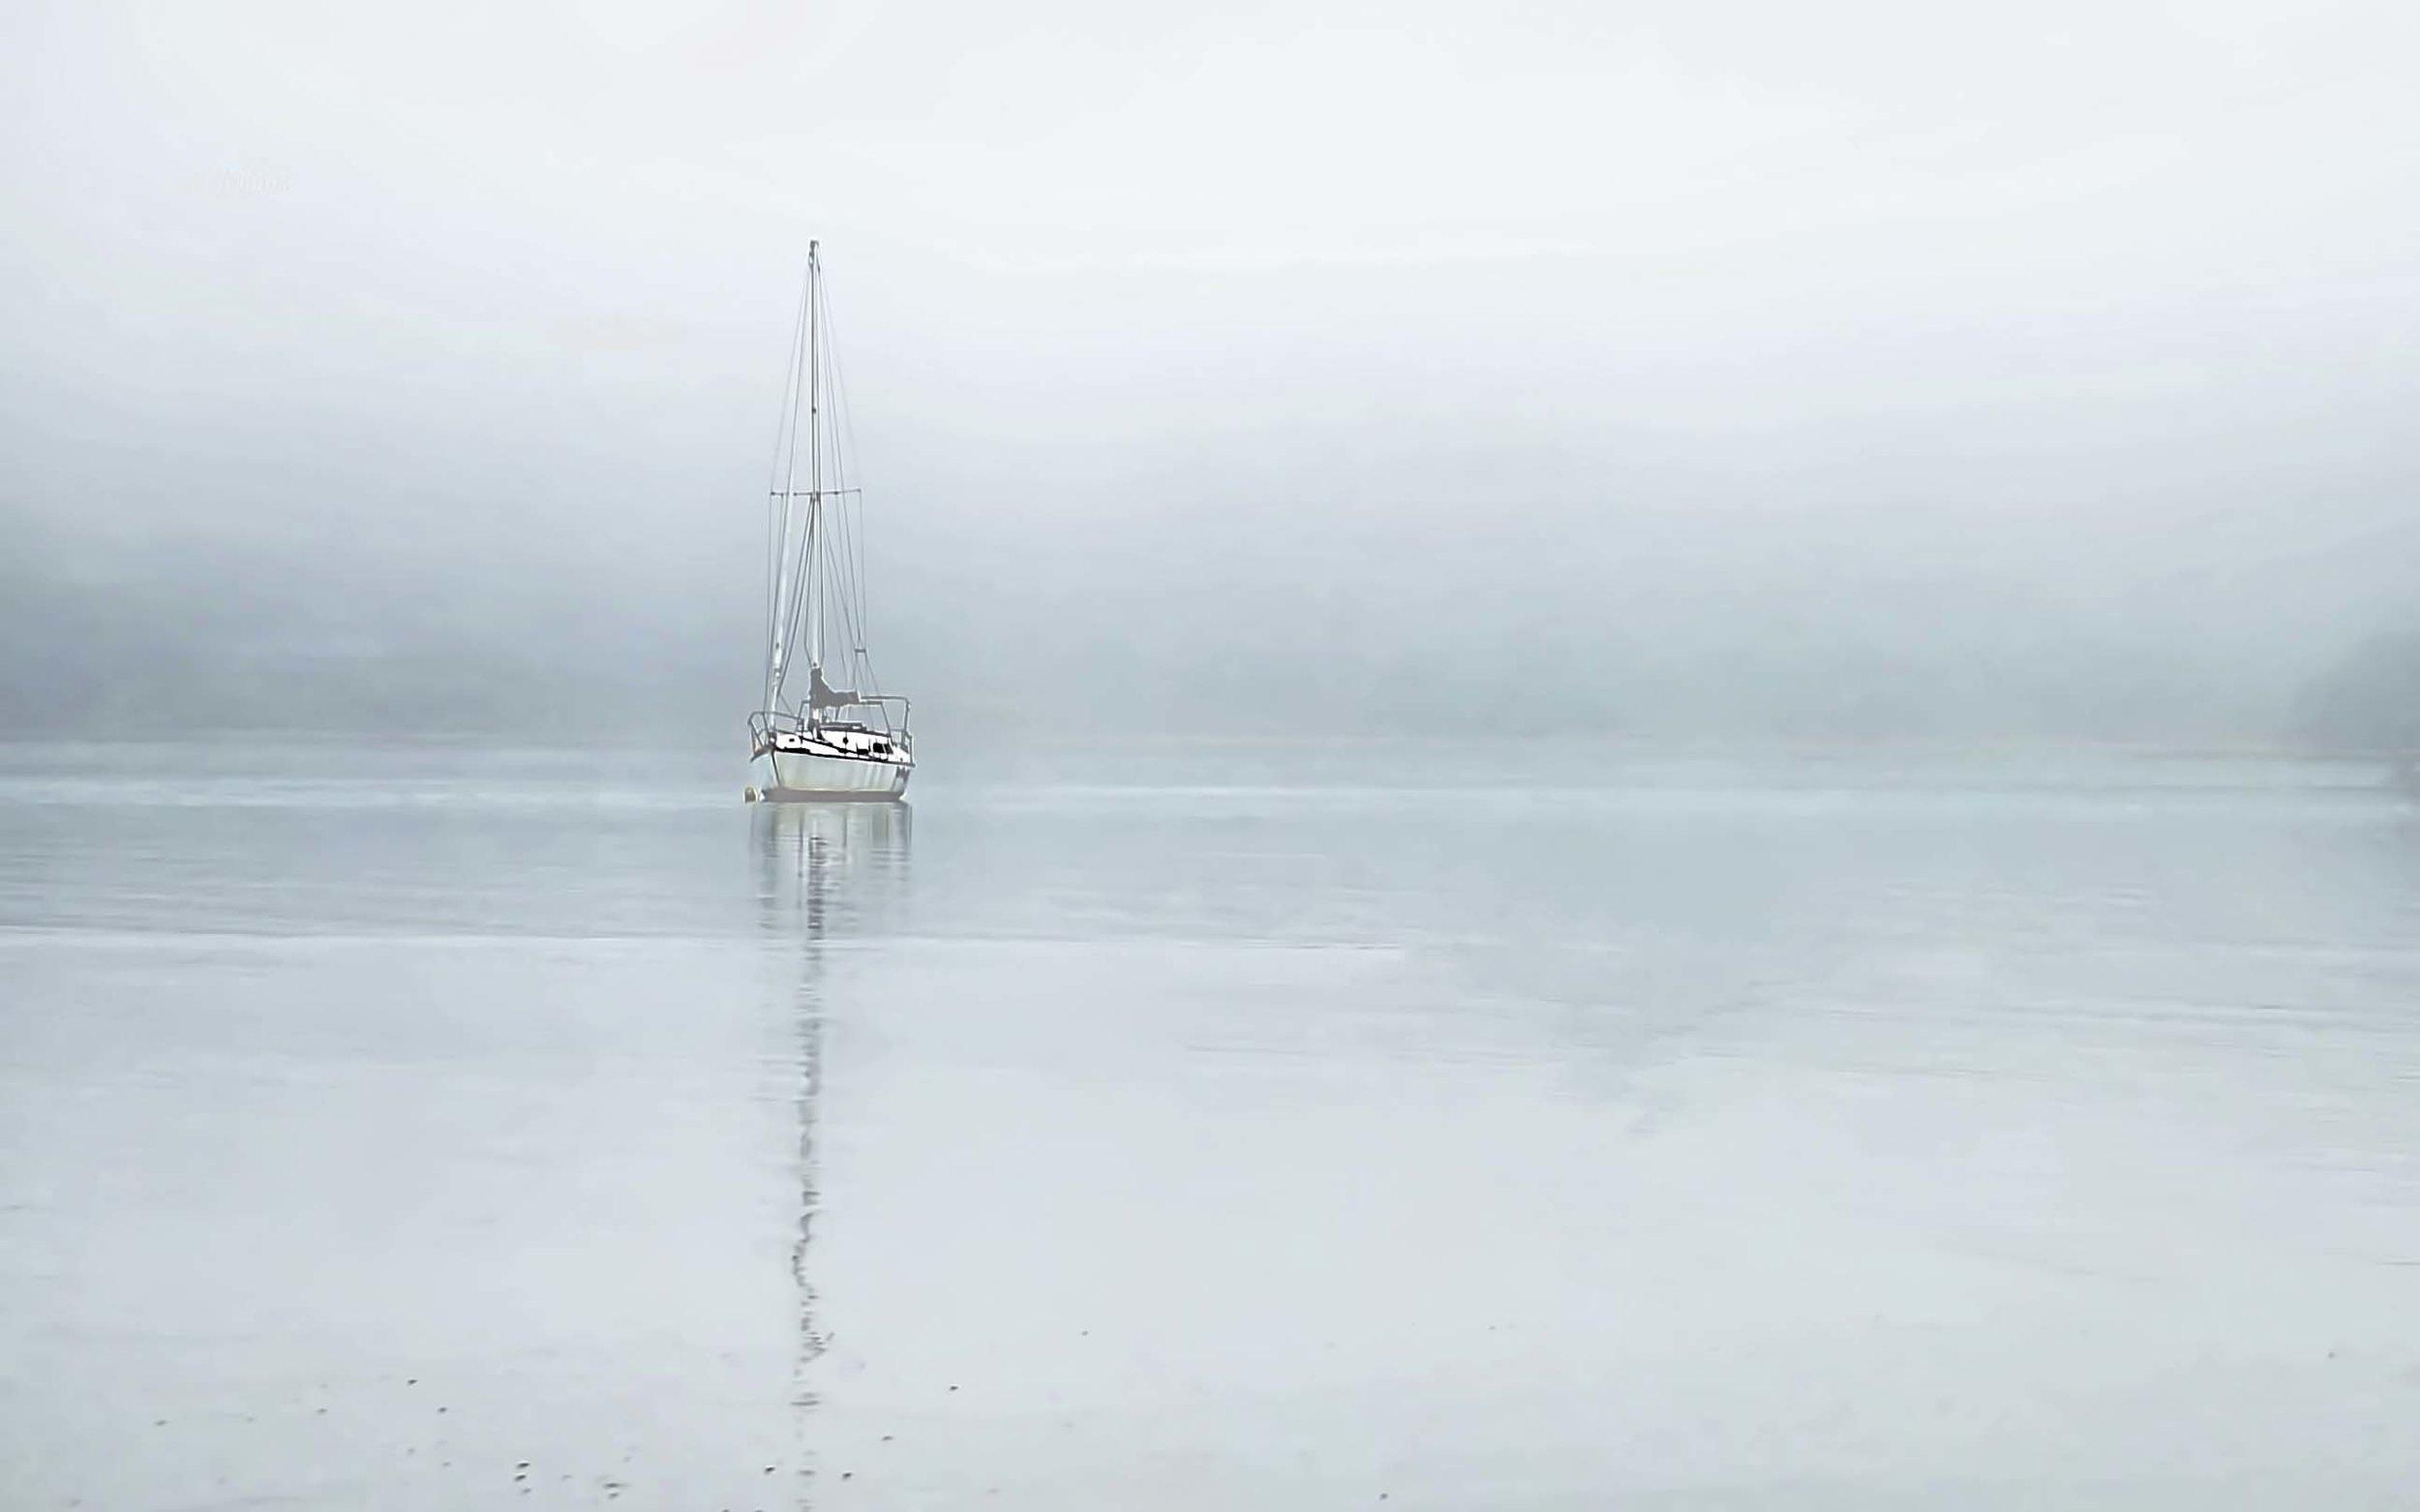 Misty morn, McLeod Bay ,Whangarei Heads, Northland, New Zealand